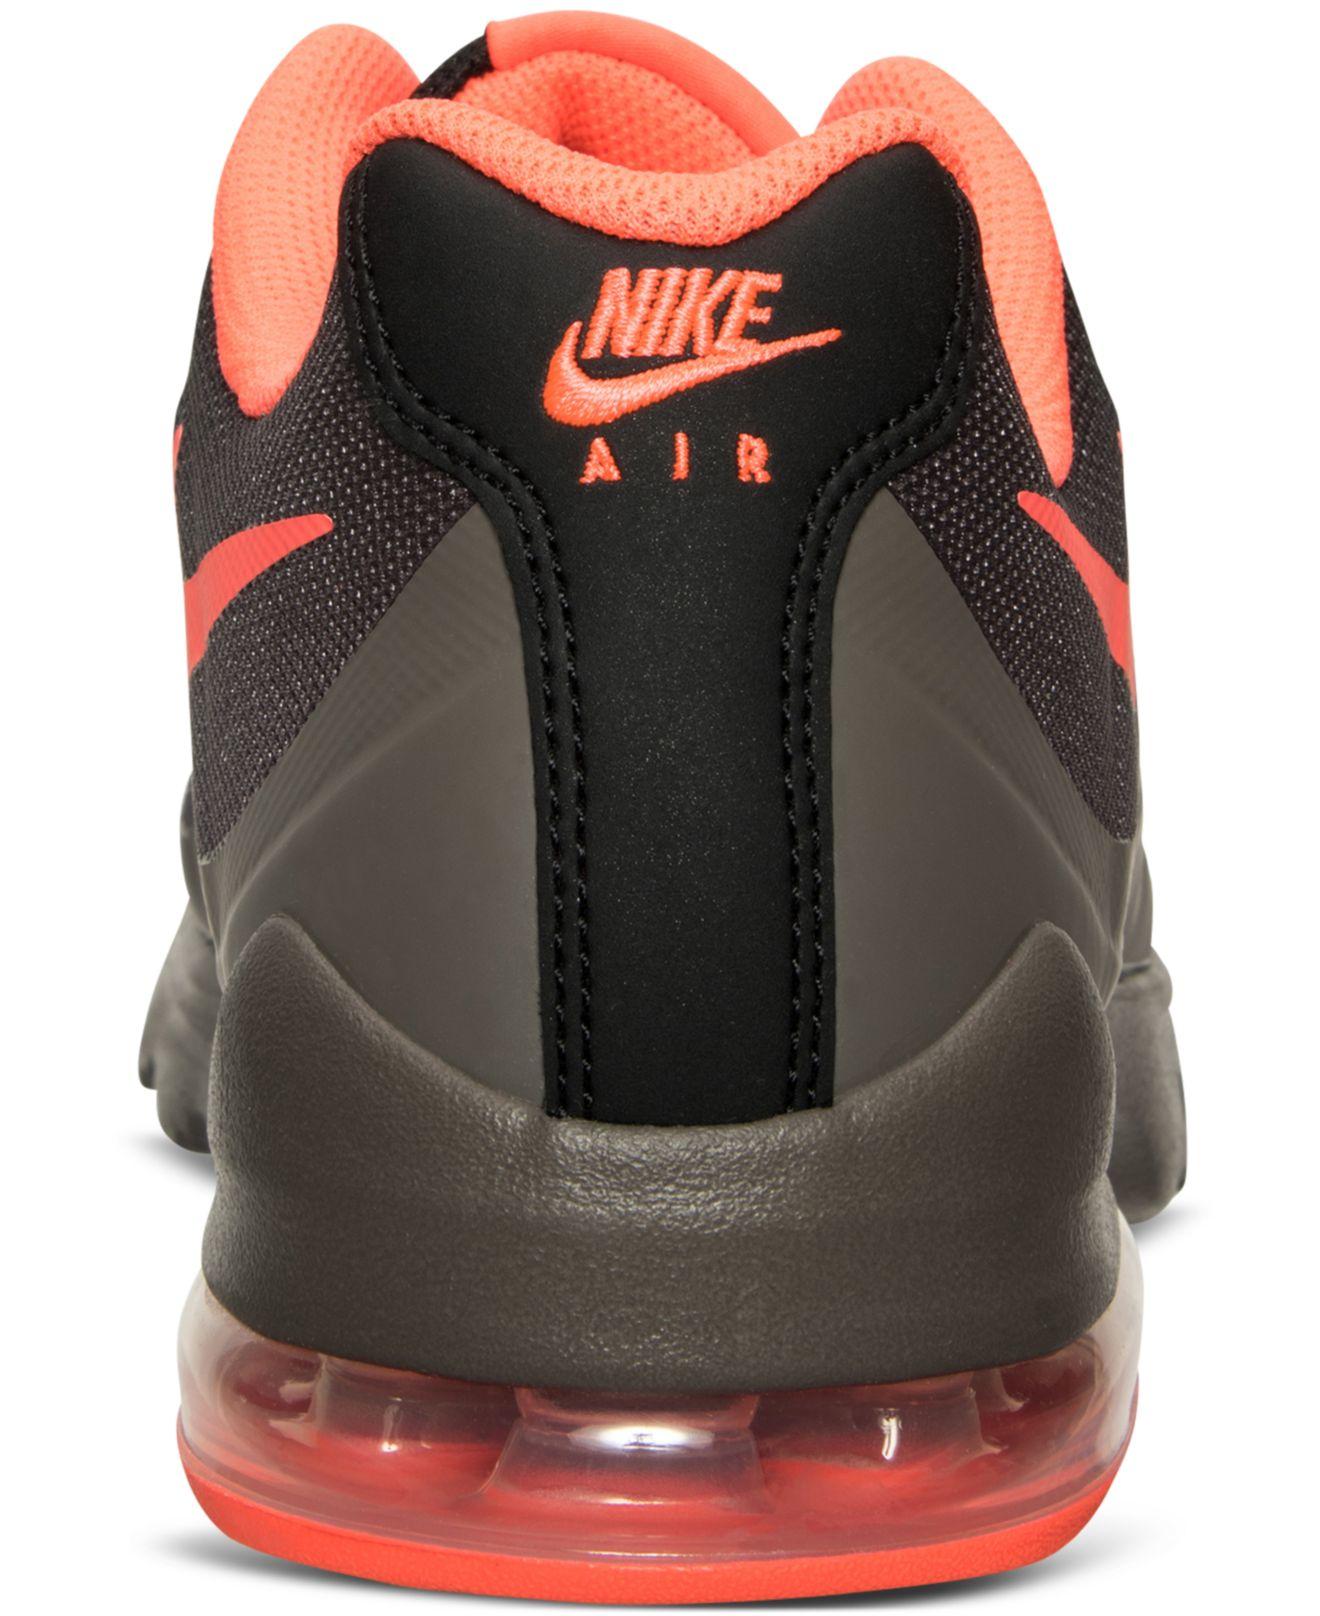 sale retailer 1cc47 fef58 Lyst - Nike Men s Air Max Invigor Print Running Sneakers From Finish Line in  Black for Men